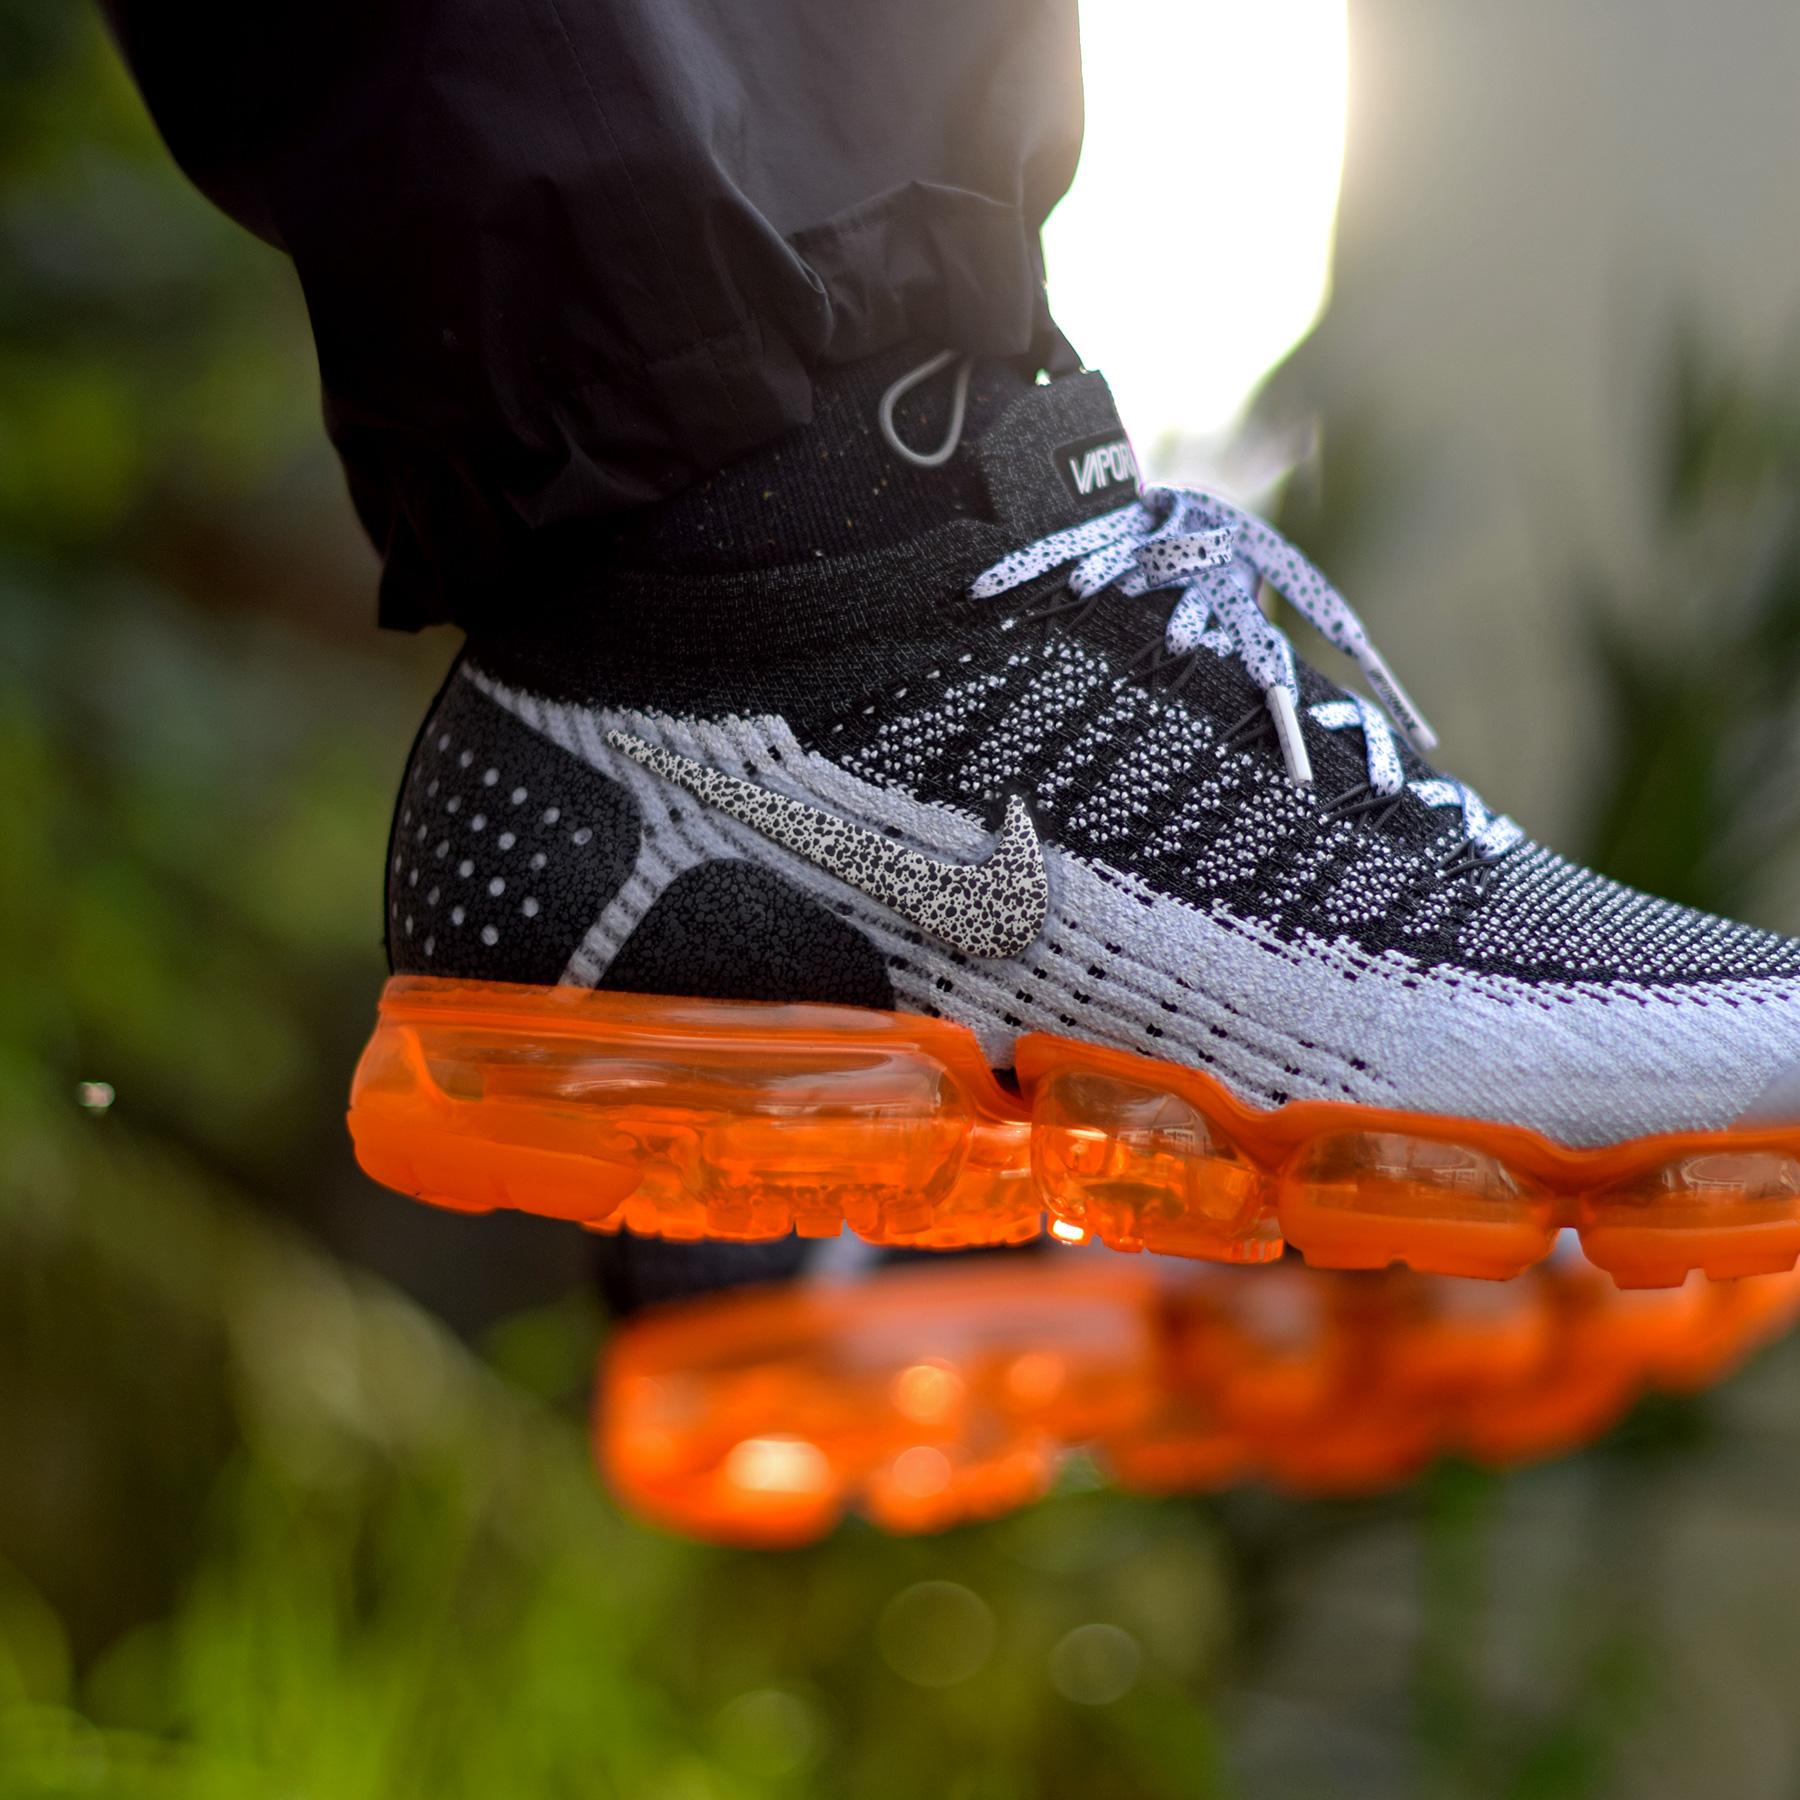 Air Flyknit « Safari Nike 2 Vapormax Srdthq »sneakers nPkNwZ08OX